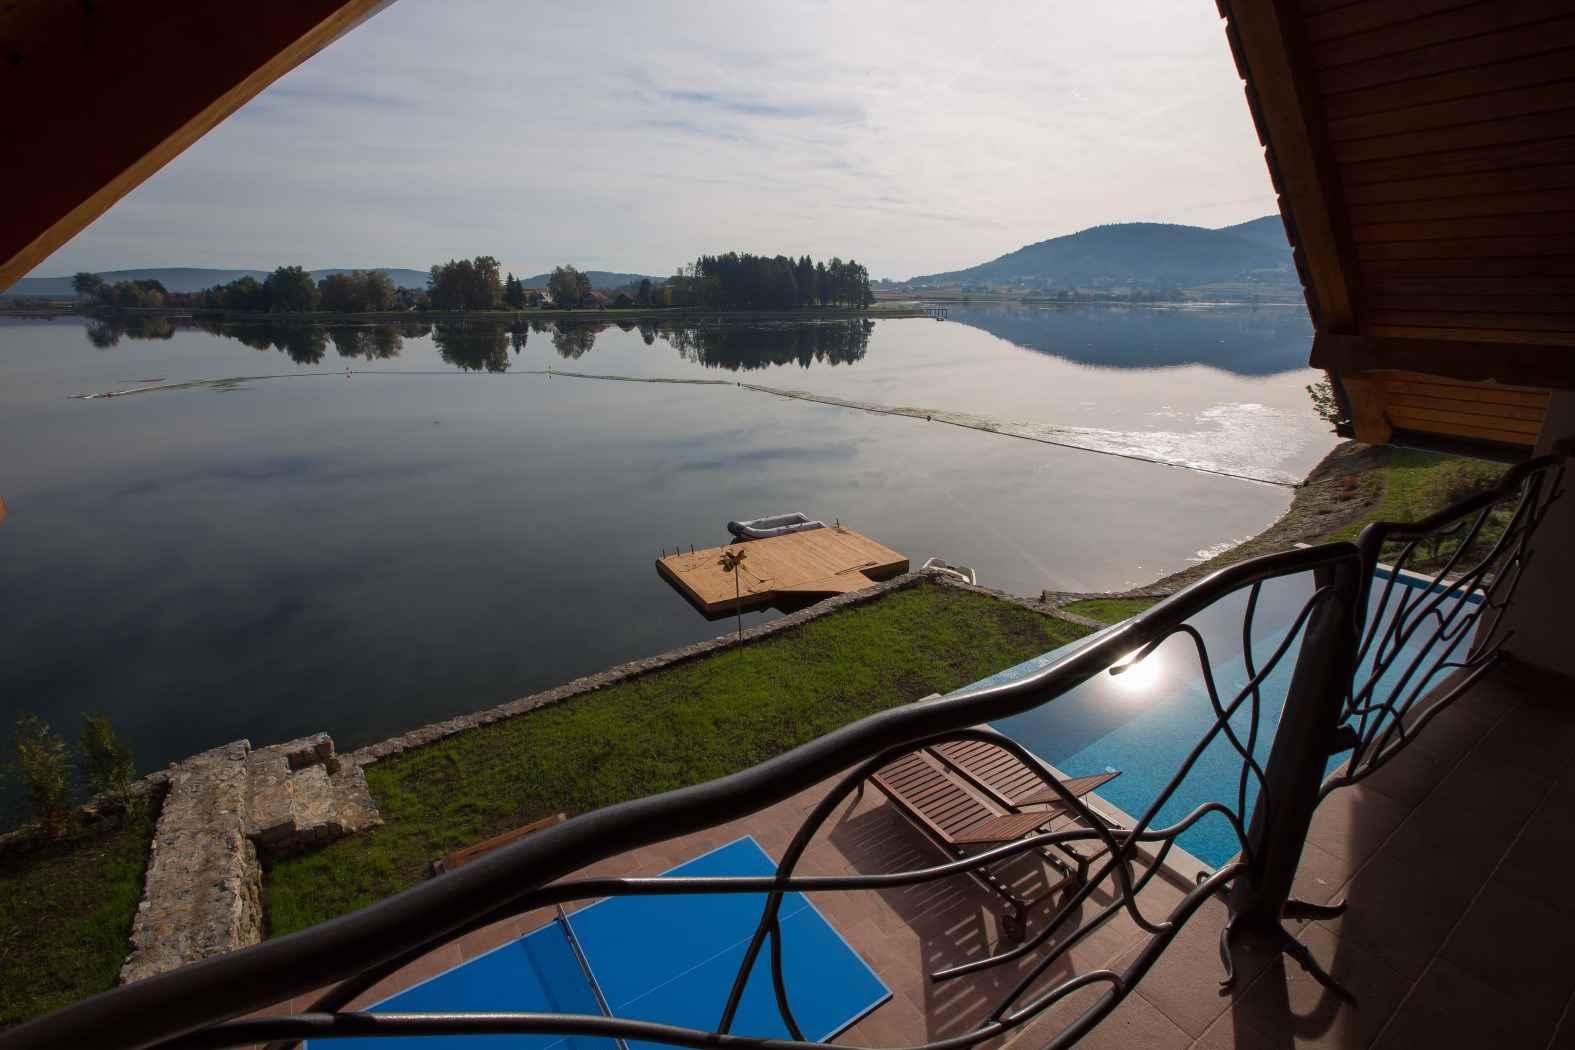 Ferienhaus mit Pool am See gelegen (2047240), Ogulin, , Mittelkroatien, Kroatien, Bild 14